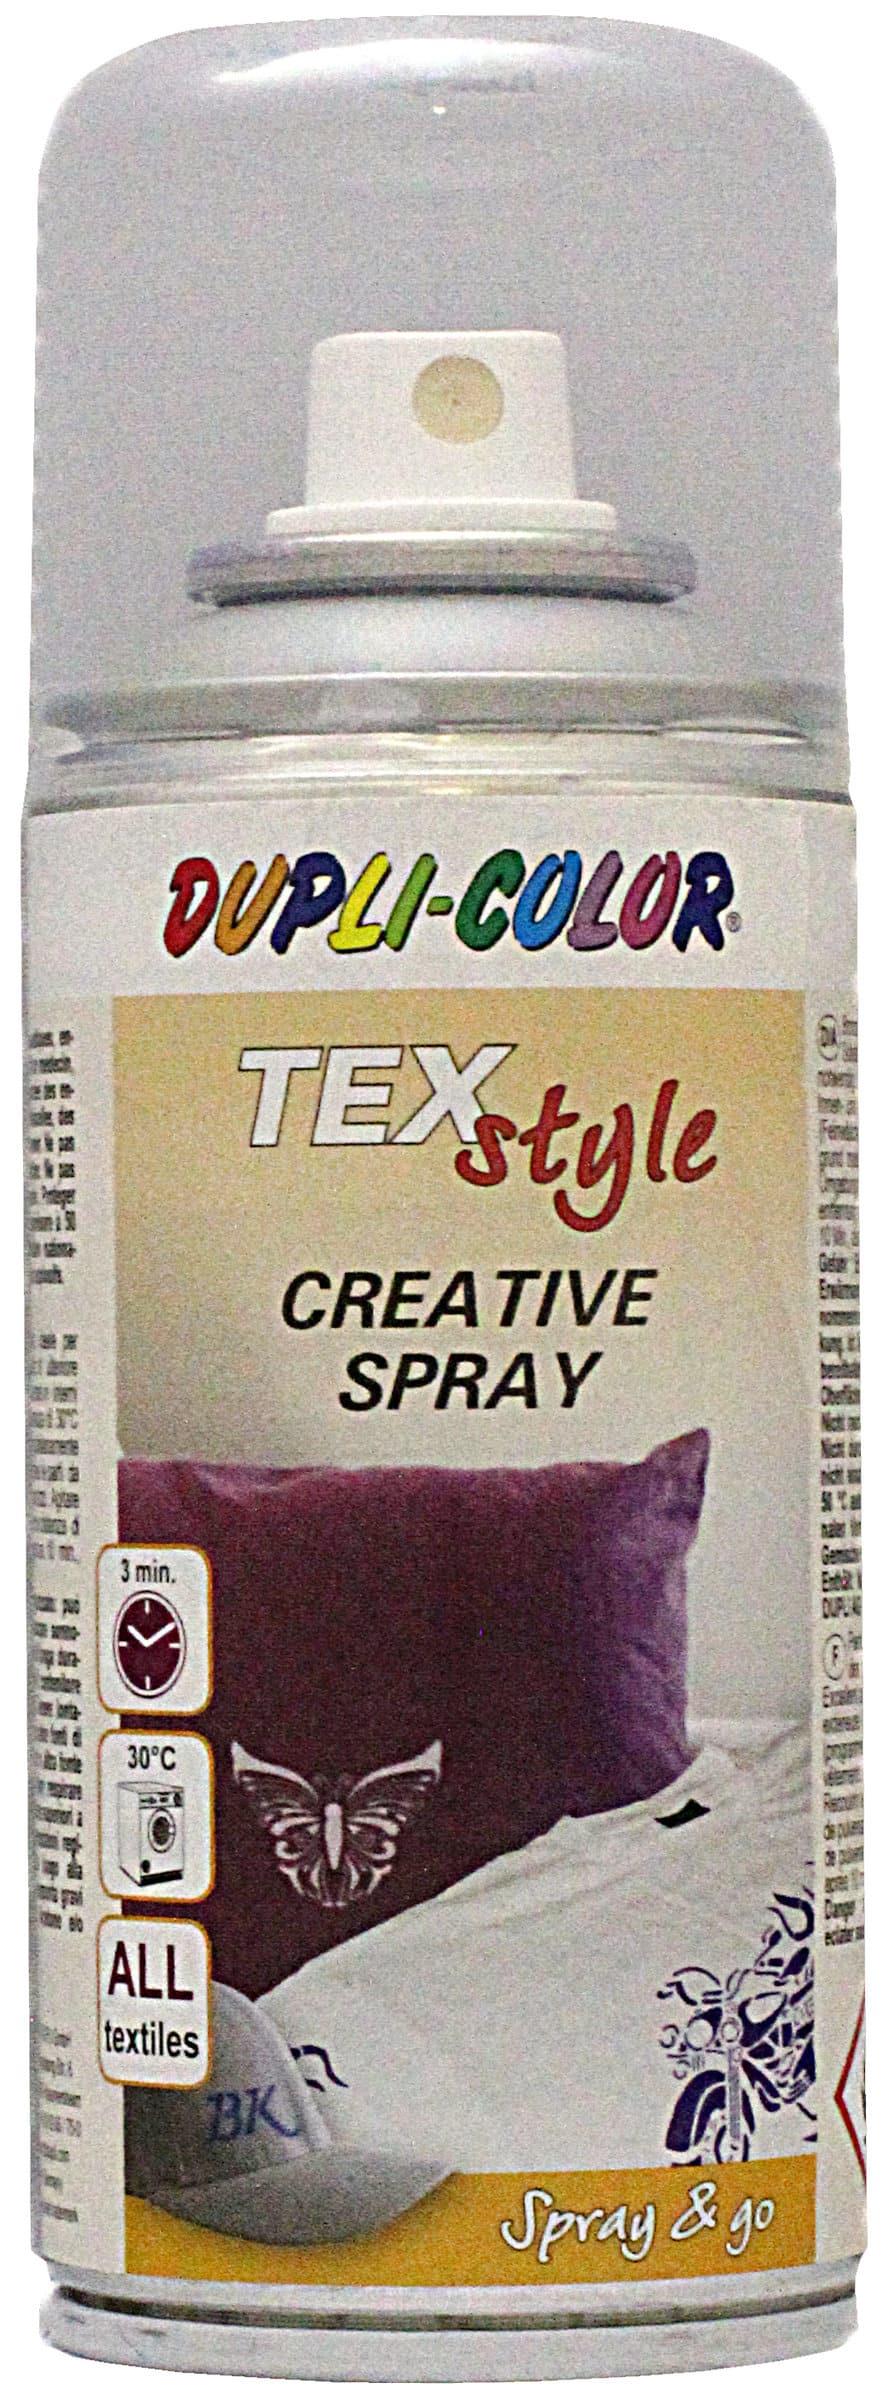 Dupli-Color vernice spray per tessuti